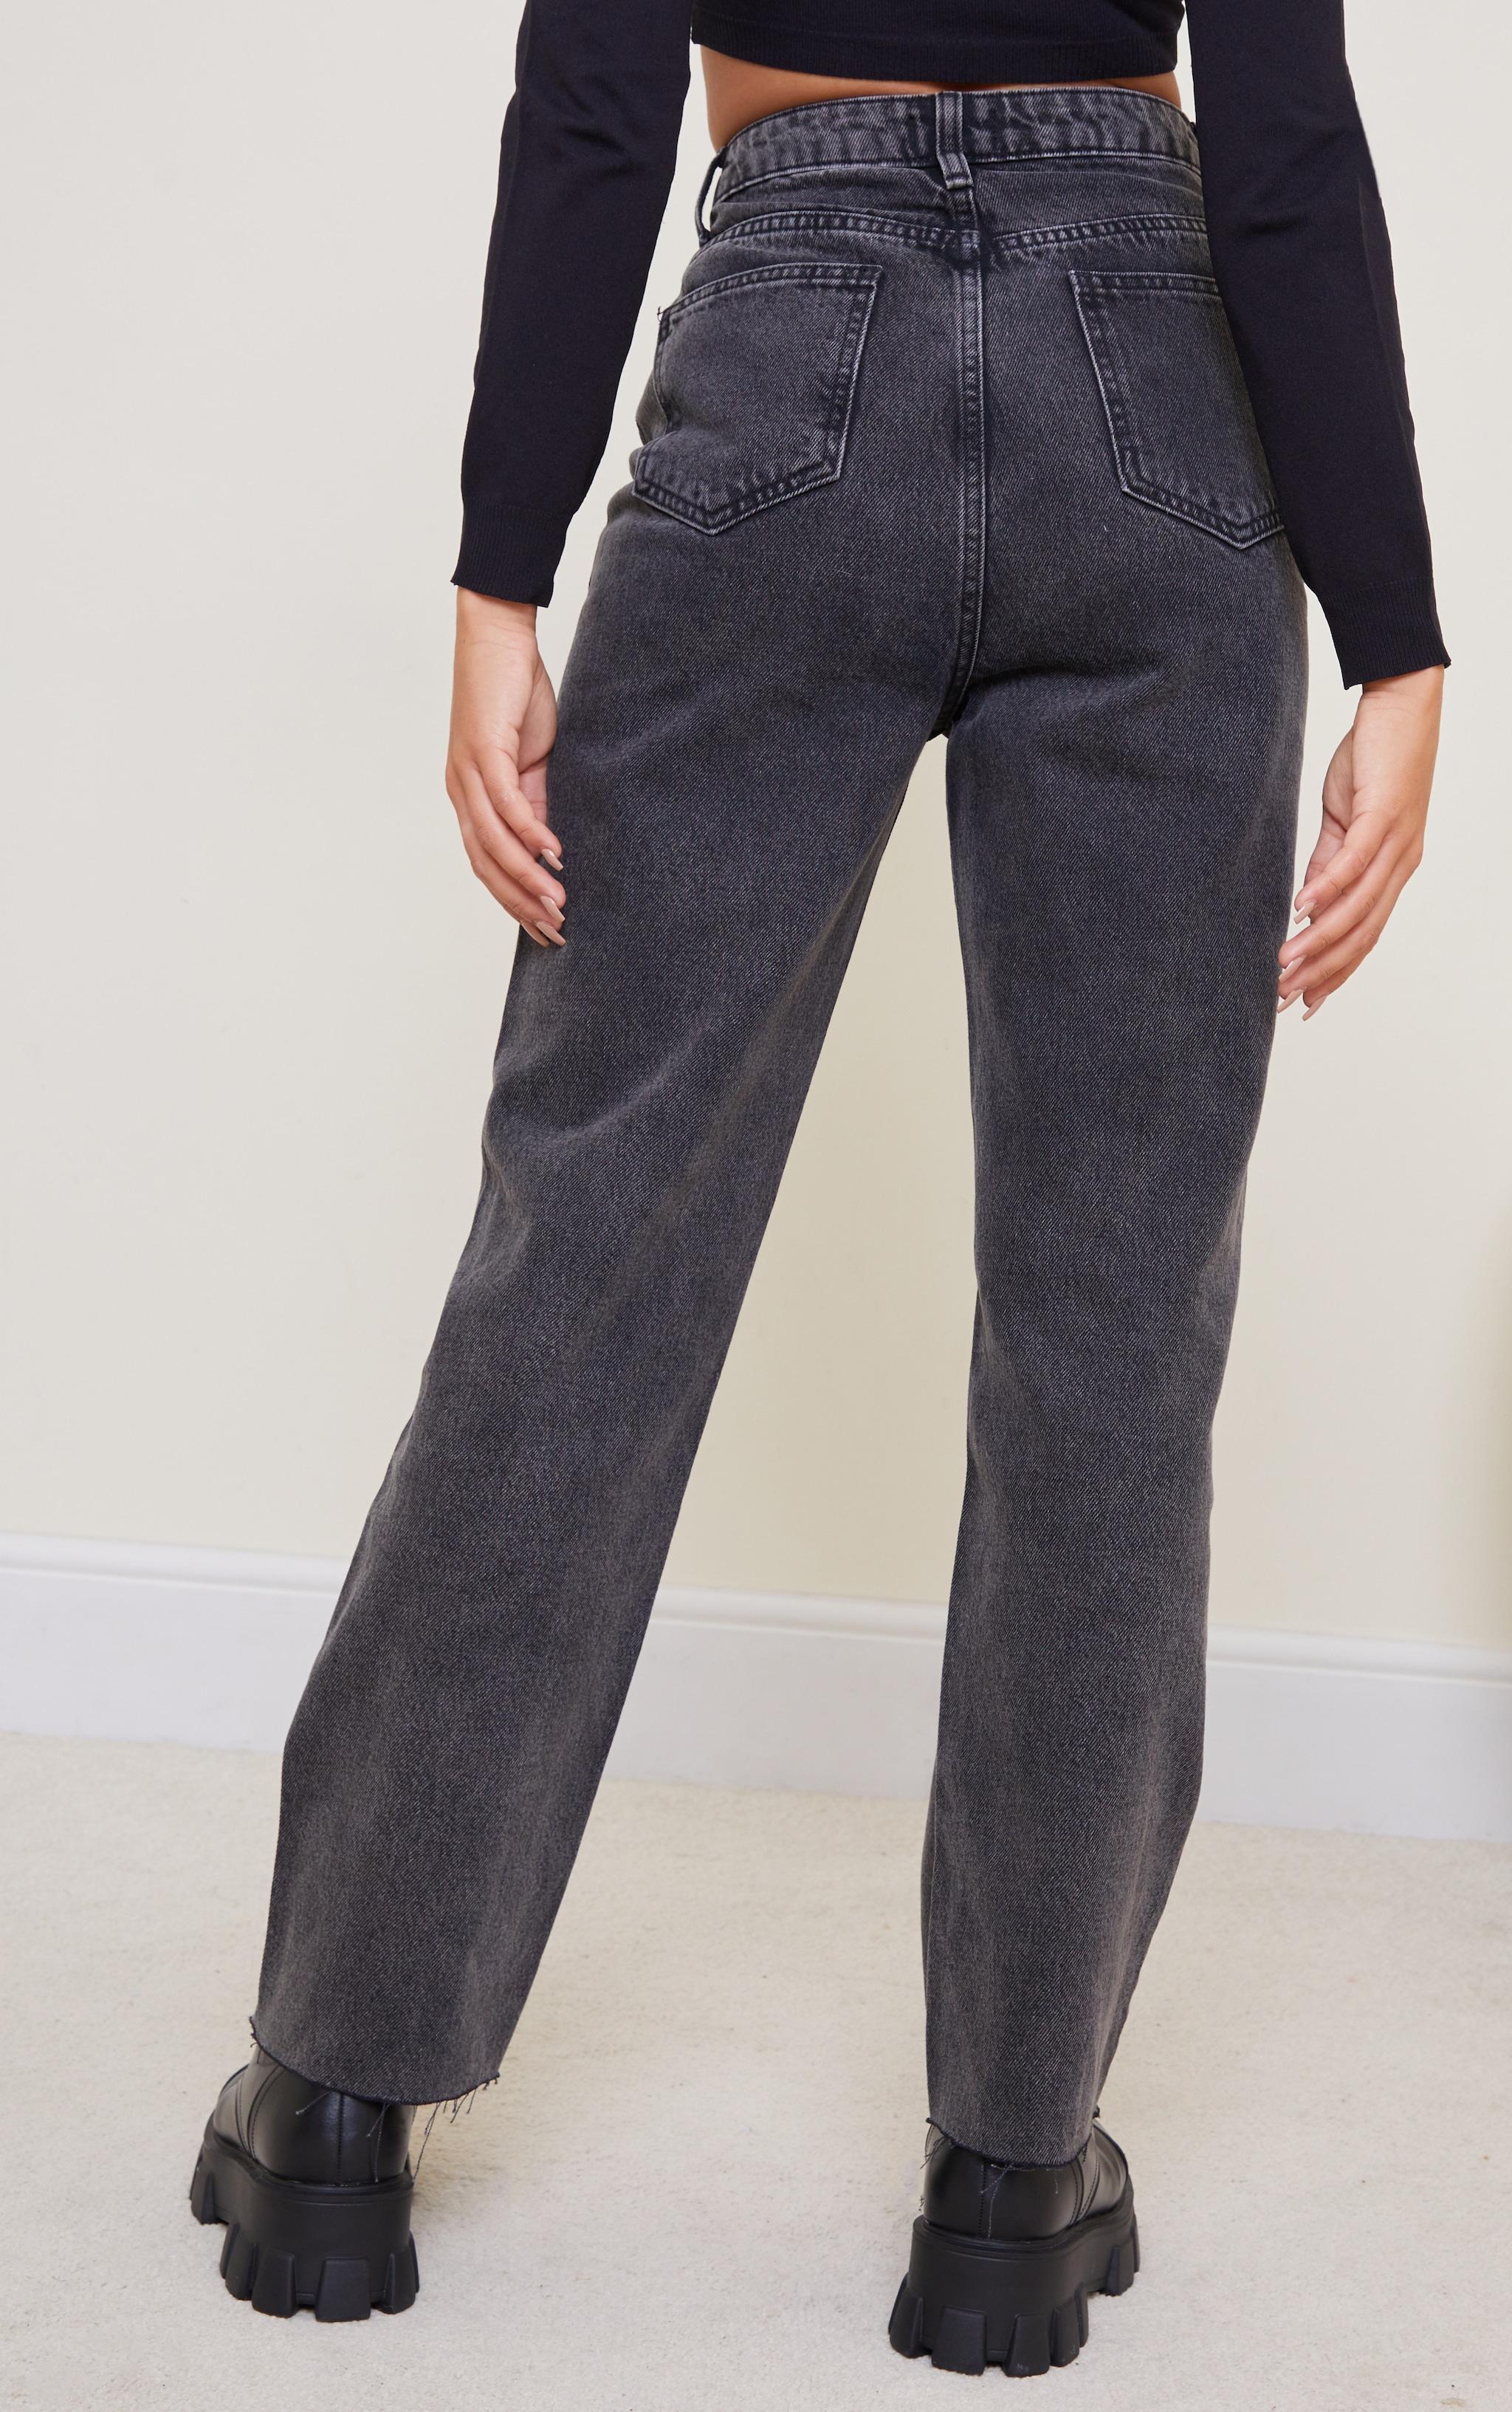 Black Acid Wash High Waisted Straight Leg Jeans 3